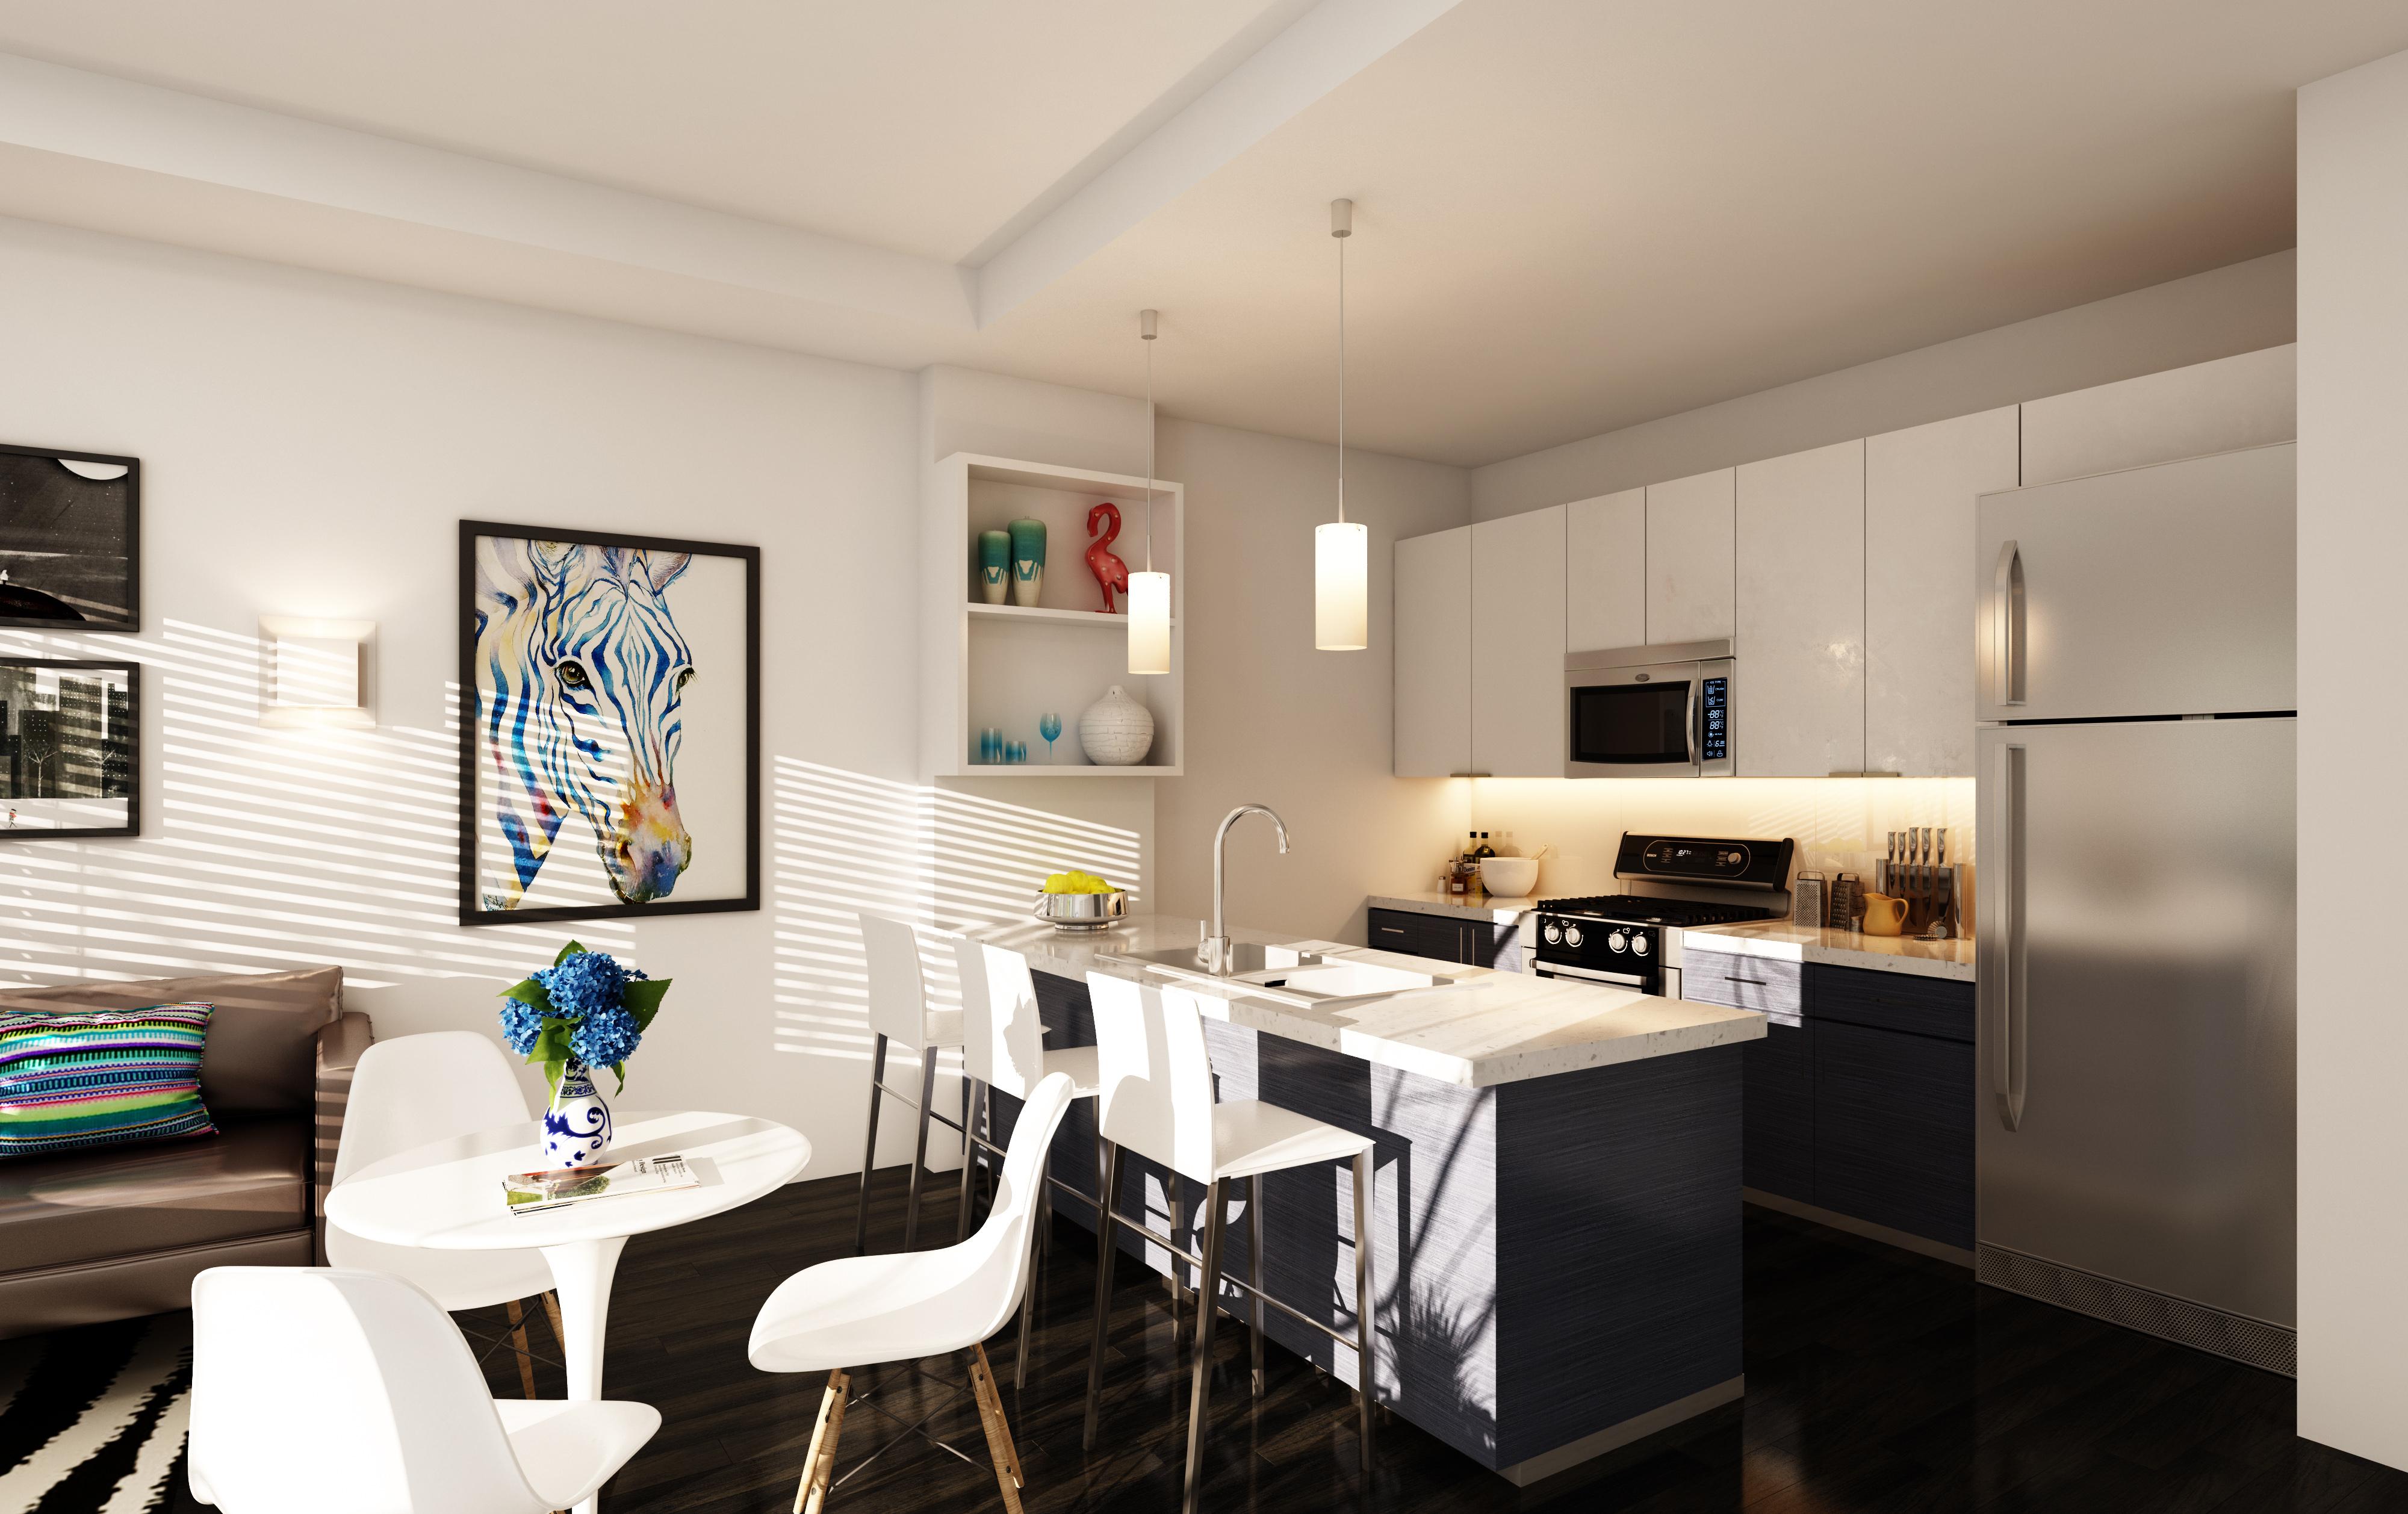 180-roslyn mid-rise apartments winnipeg engineering Sunstone Development Infrastructure Winnipeg Osborne Village